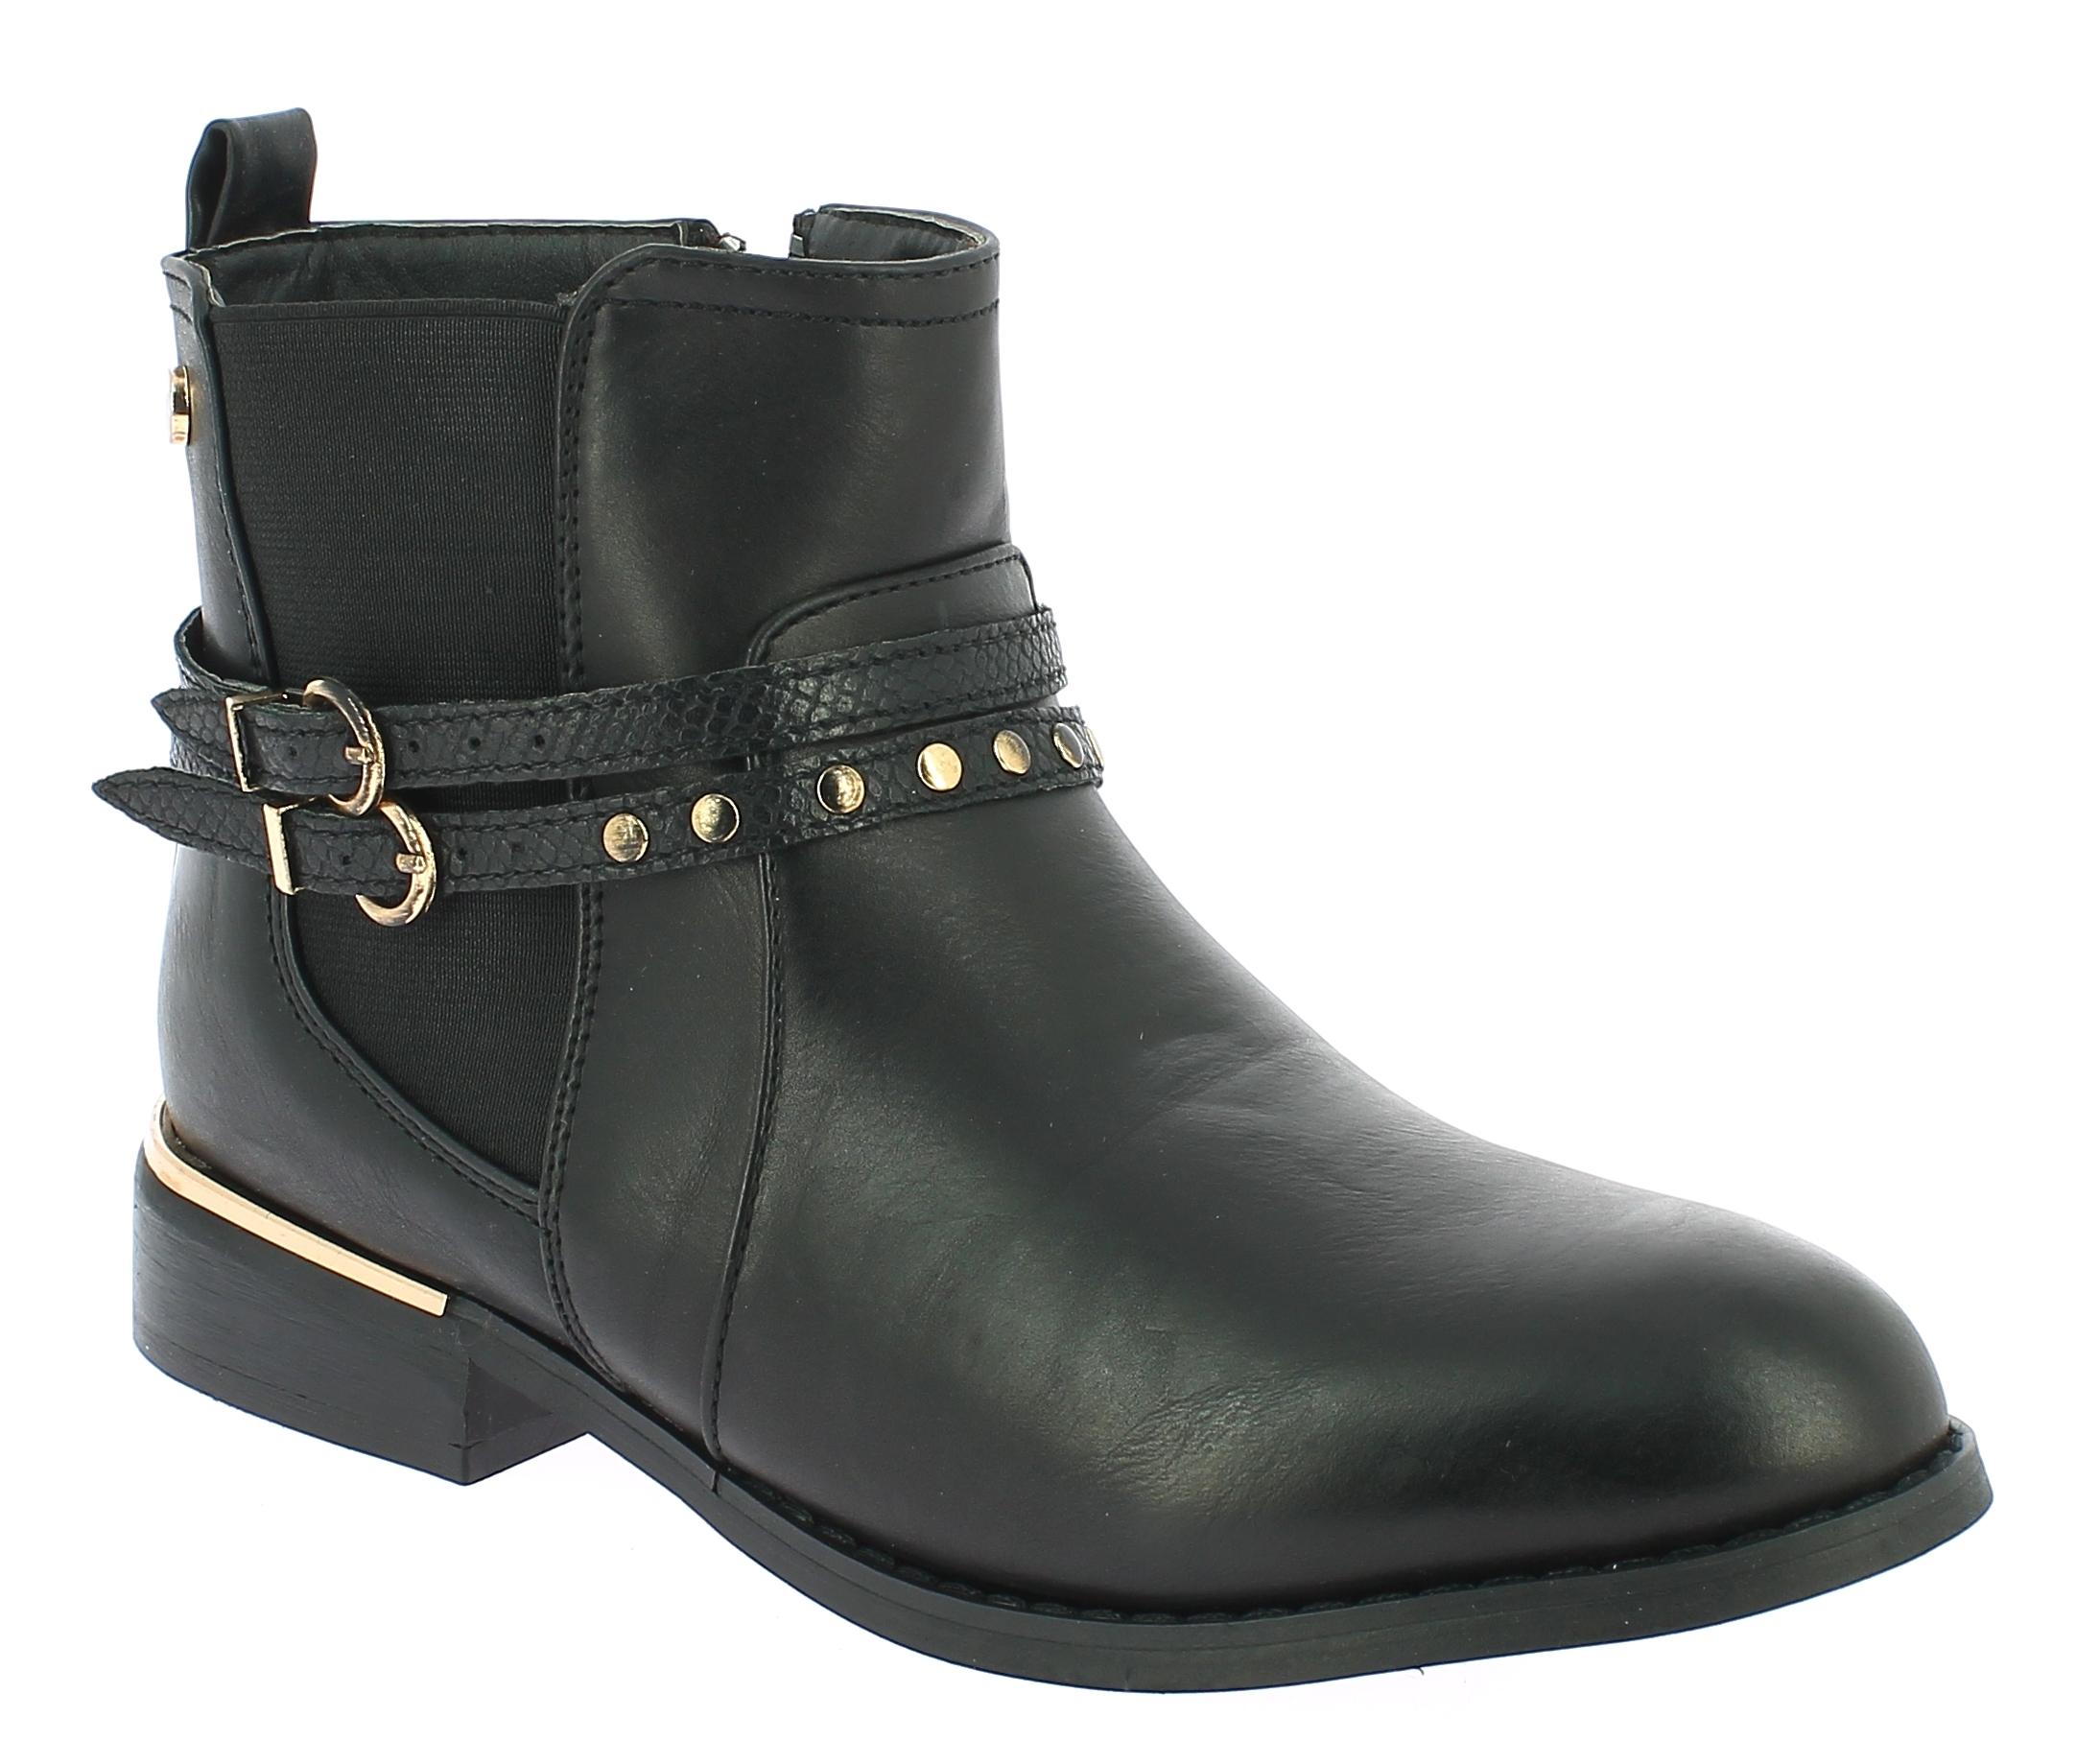 TOPWAY Γυναικείο Μποτάκι B750020 Μαύρο - IqShoes - B750020 BLACK-black-36/1/15/7 παπούτσια  γυναικεία μποτάκια